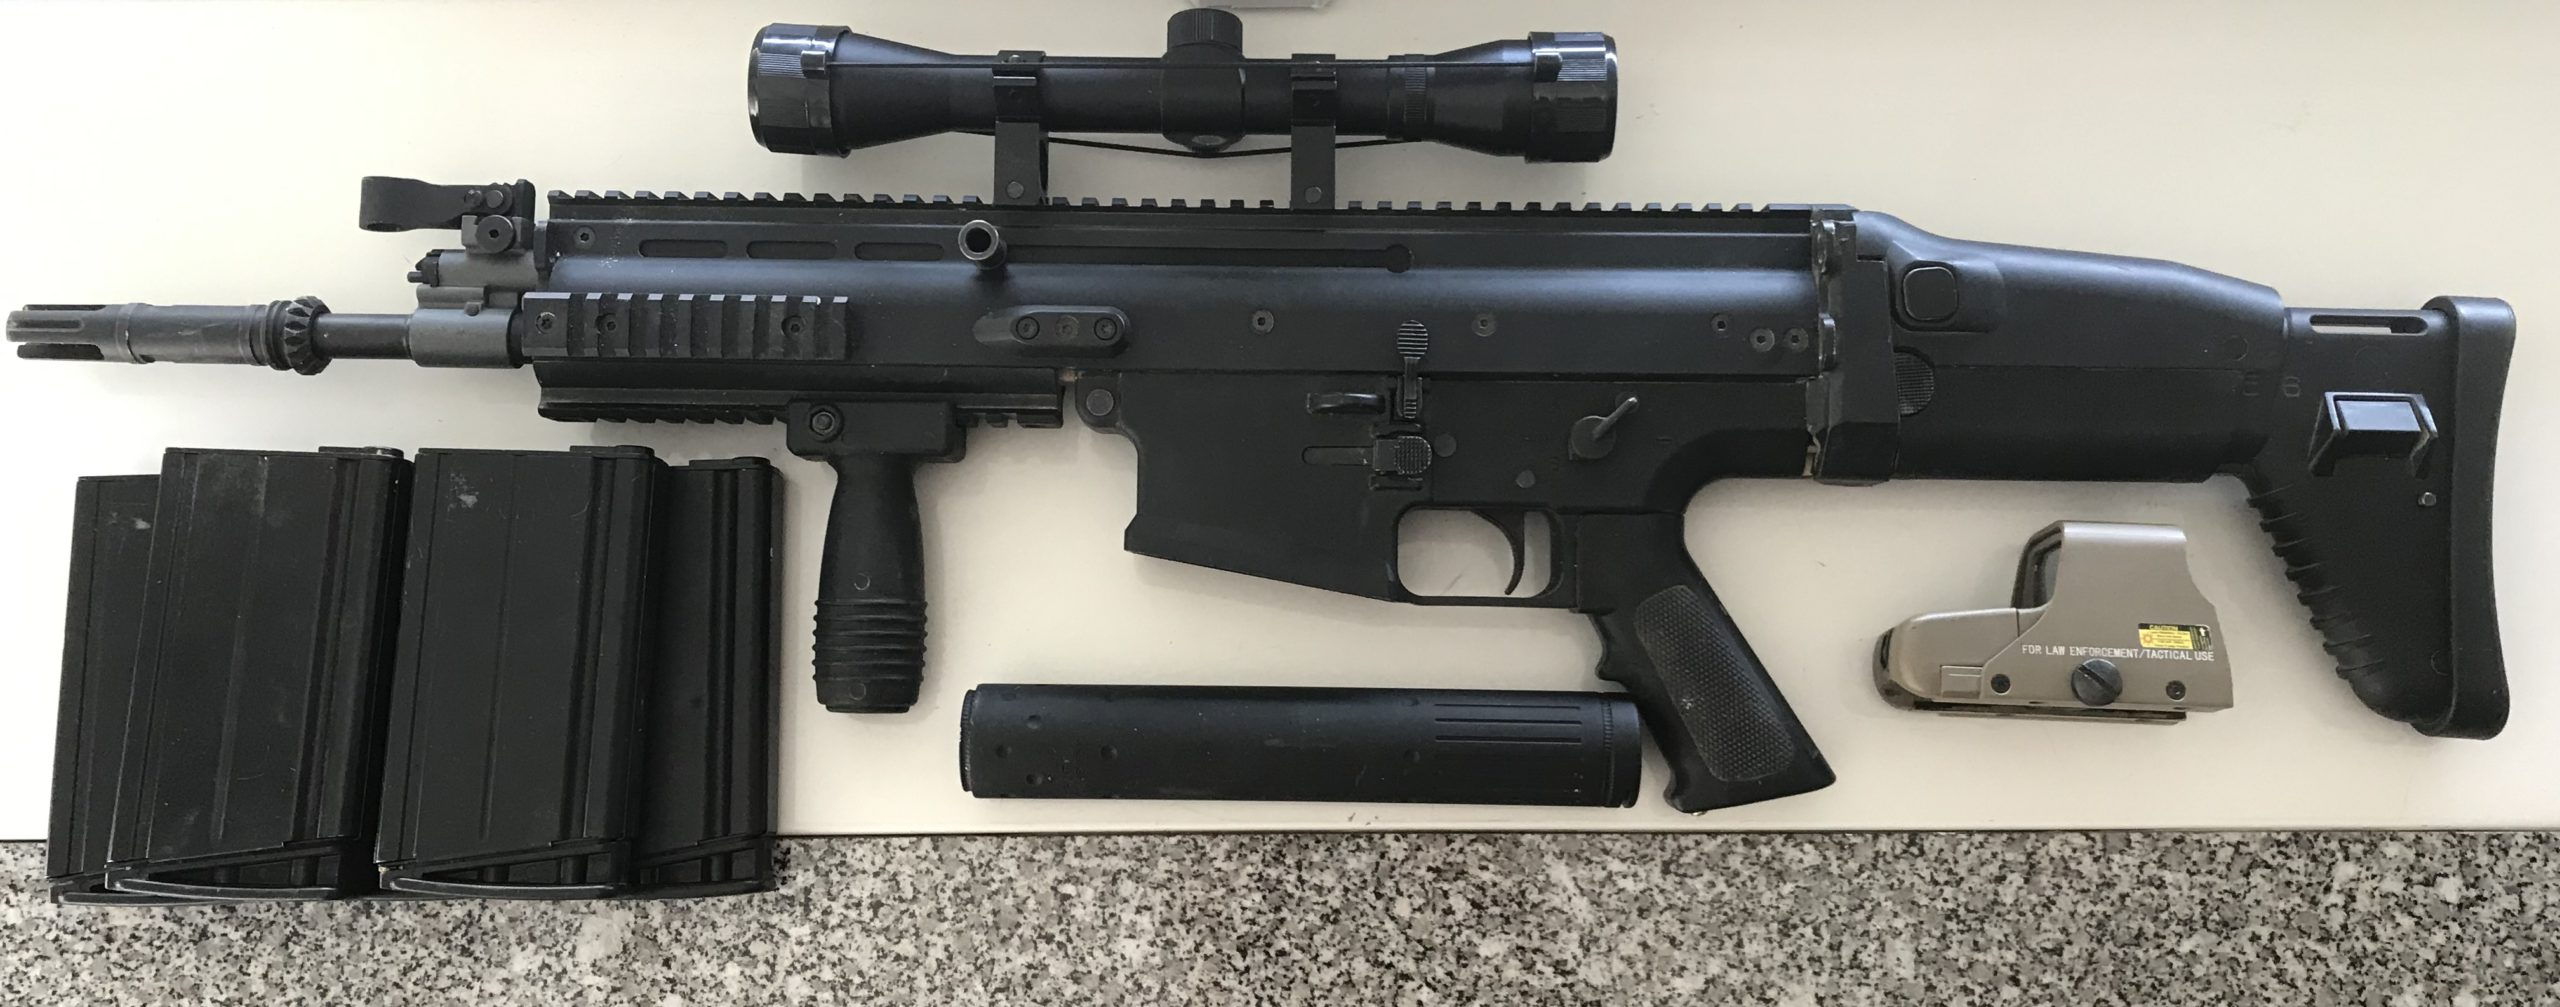 Scar h VFC UPGRADE, 5 chargeurs, Lunette 4×32, viseur HOLO, silencieux angry gun, poignée